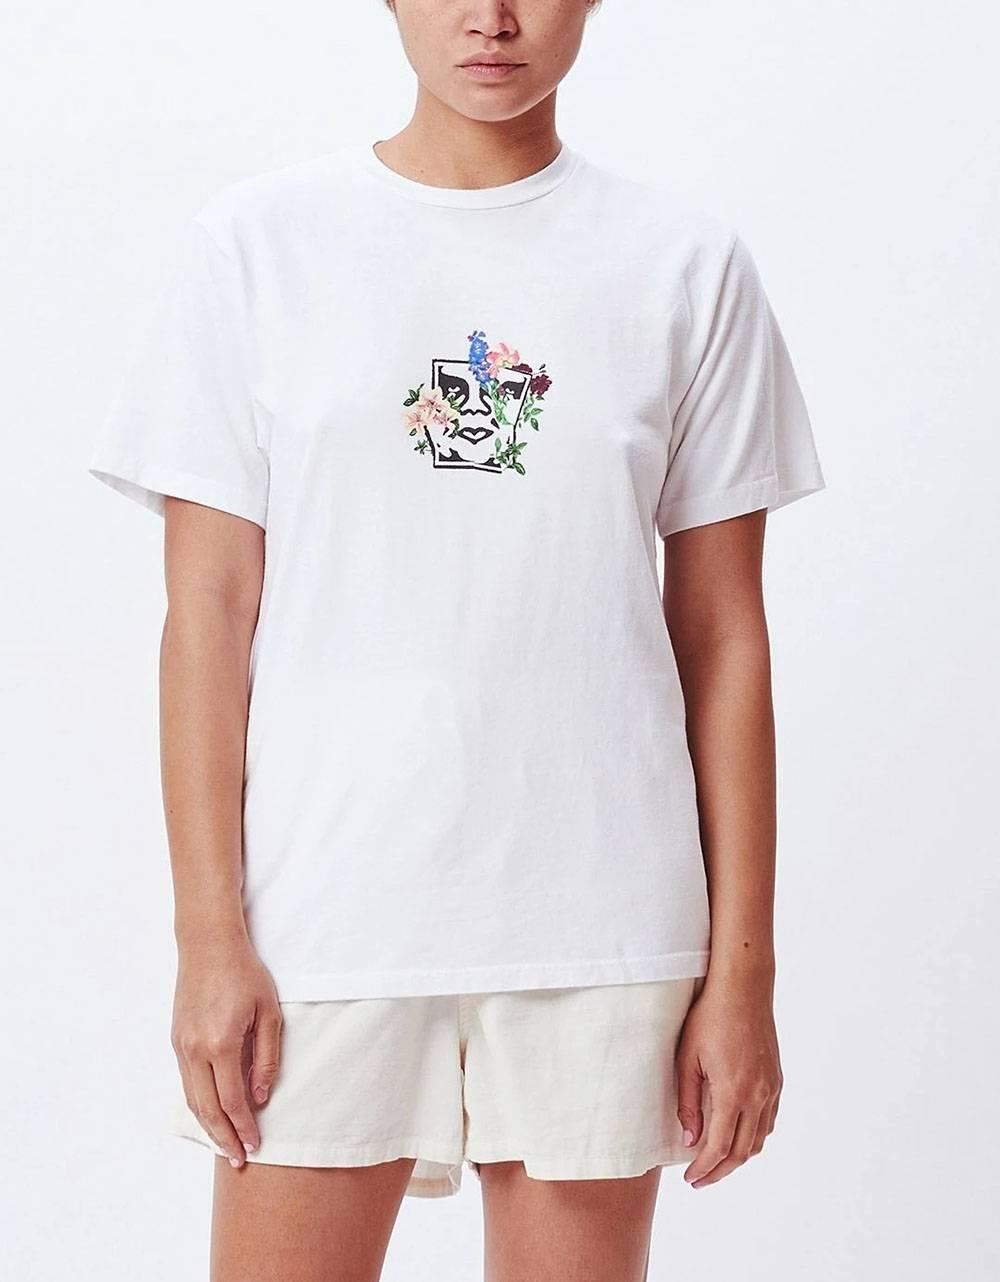 Obey Woman Flower burst choice box tee - white obey T-shirt 45,00€